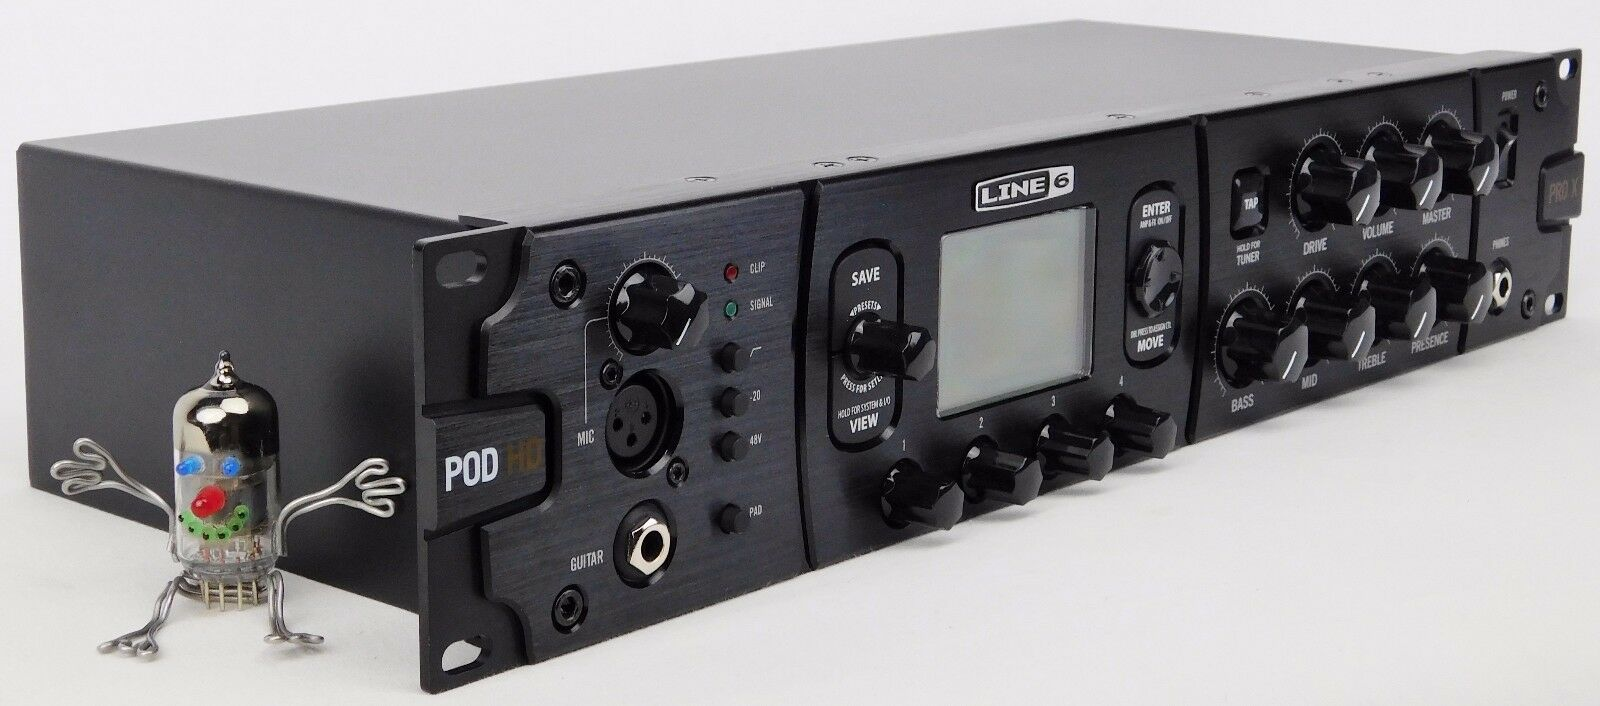 Line 6 Pod HD ProX Guitar Modeling Processor + Neuwertig + 2 Jahre Garantie